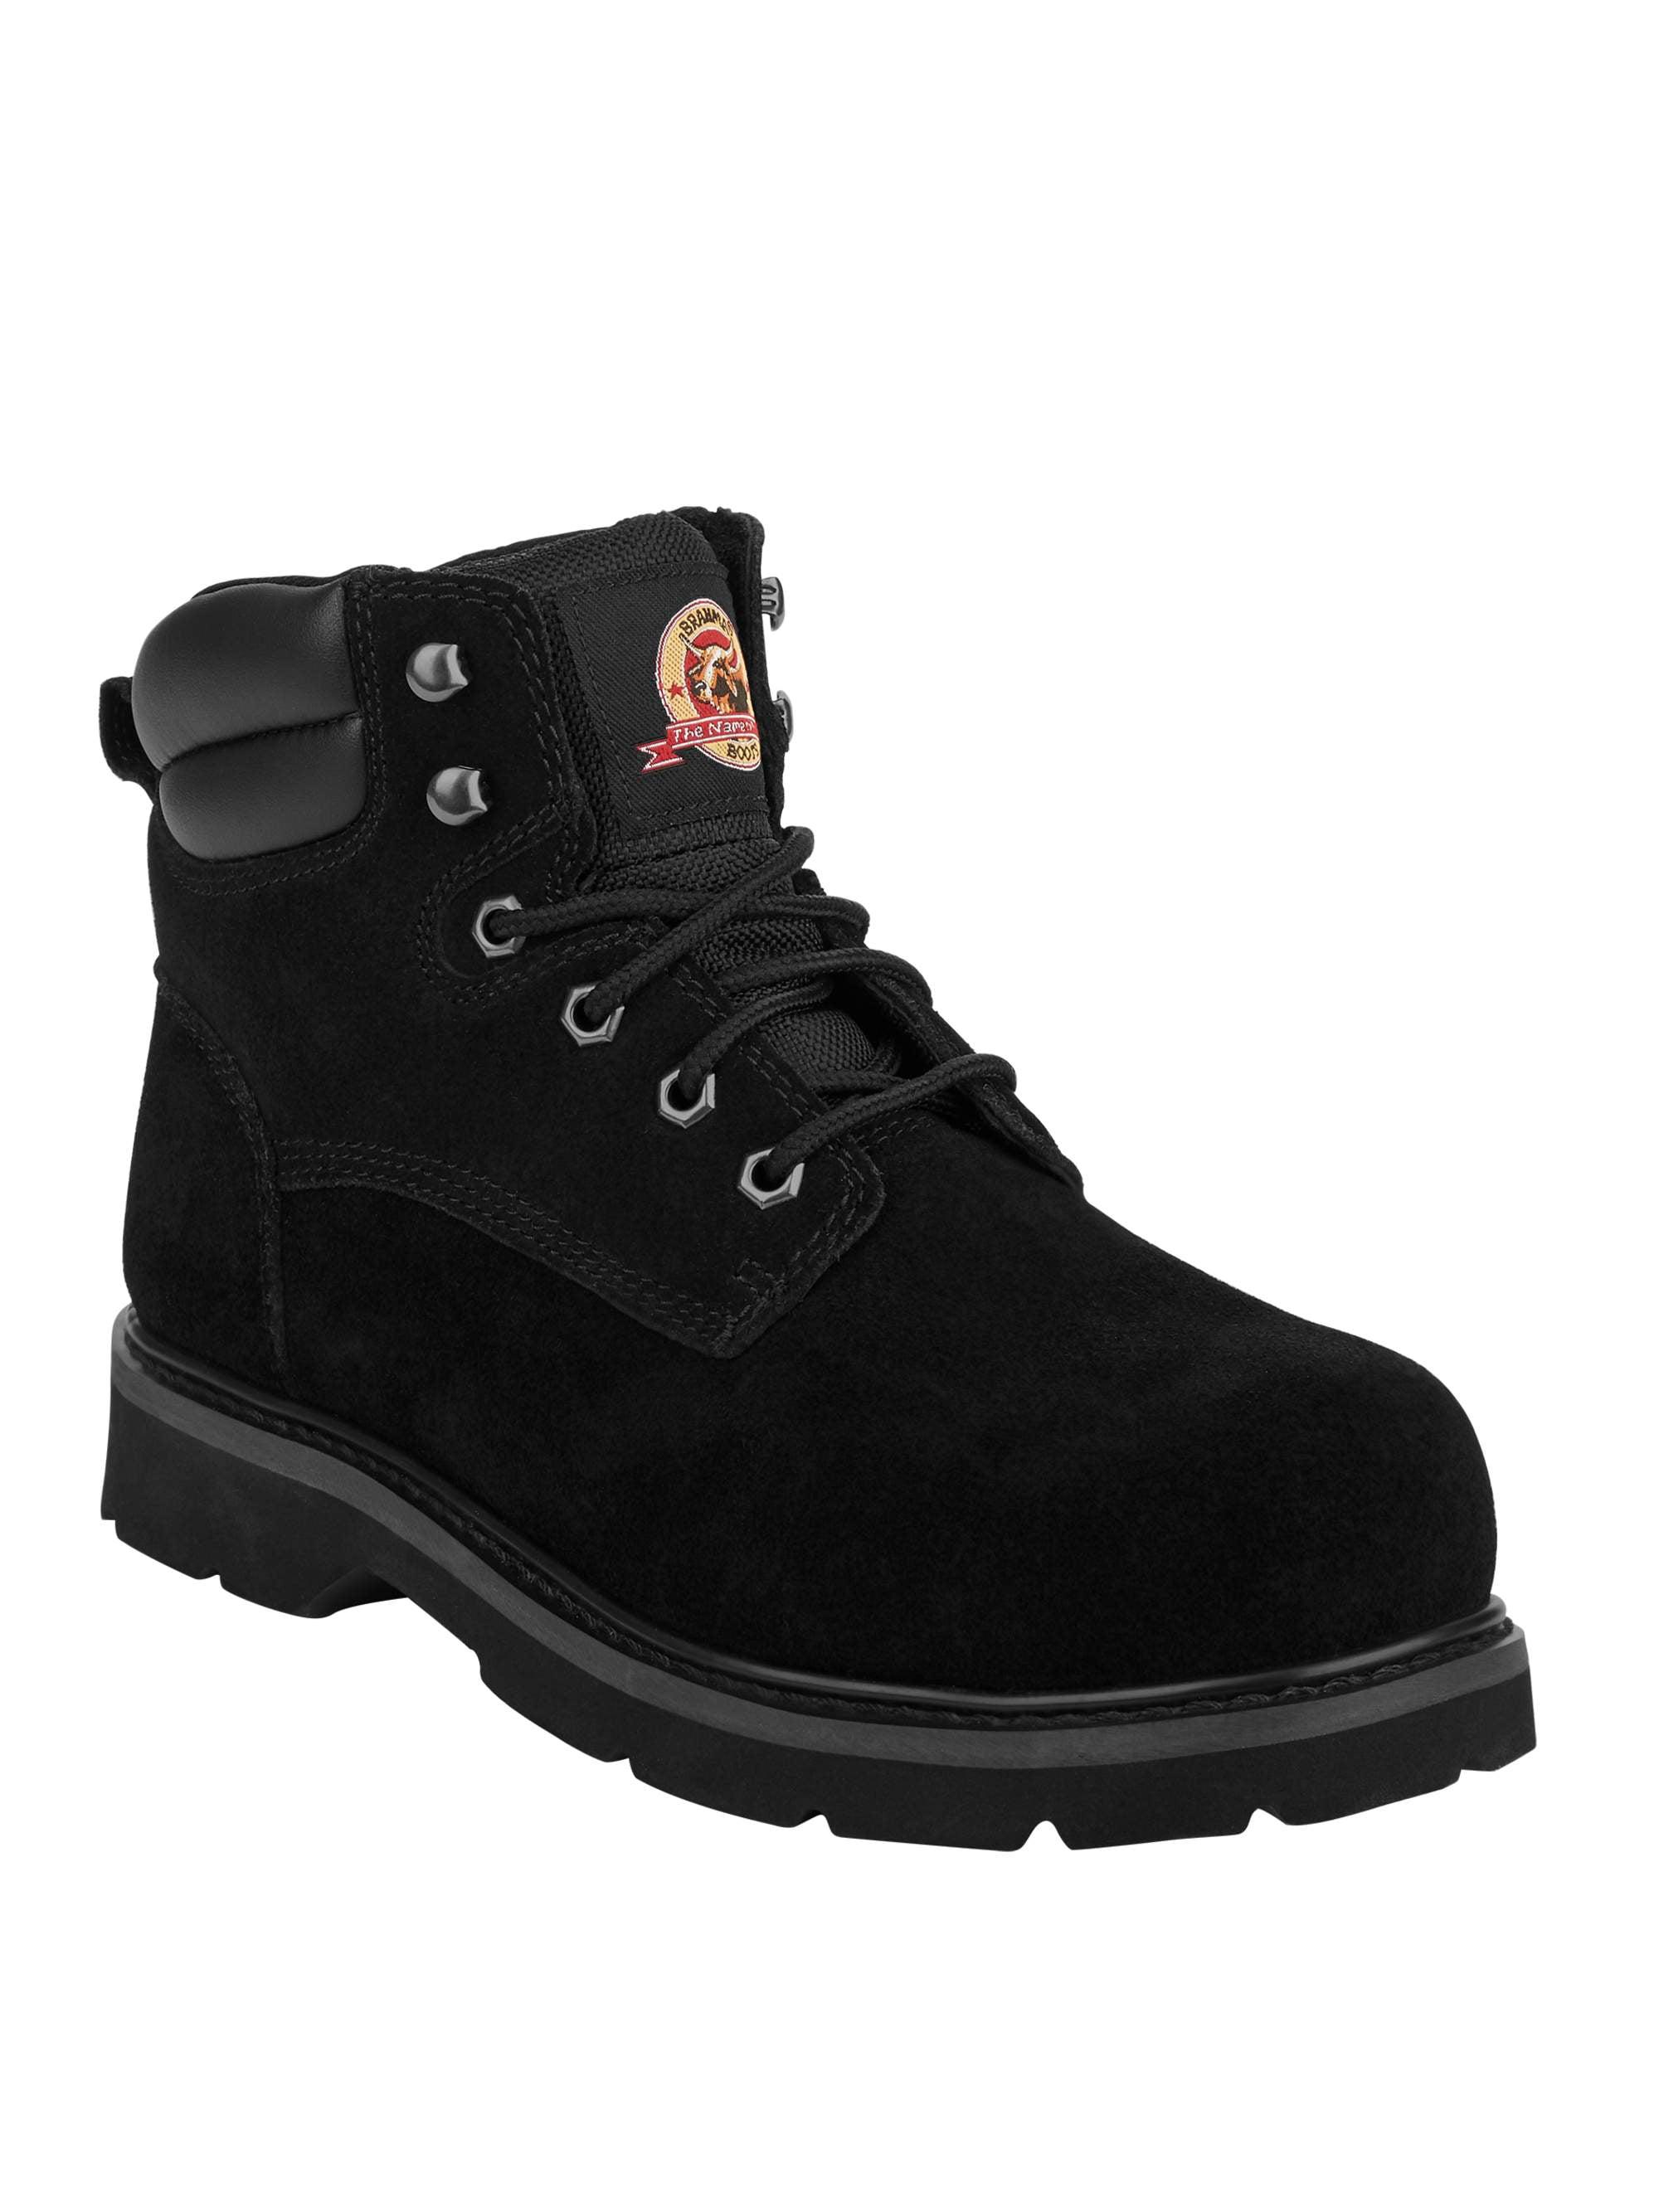 walmart mens slip on boots